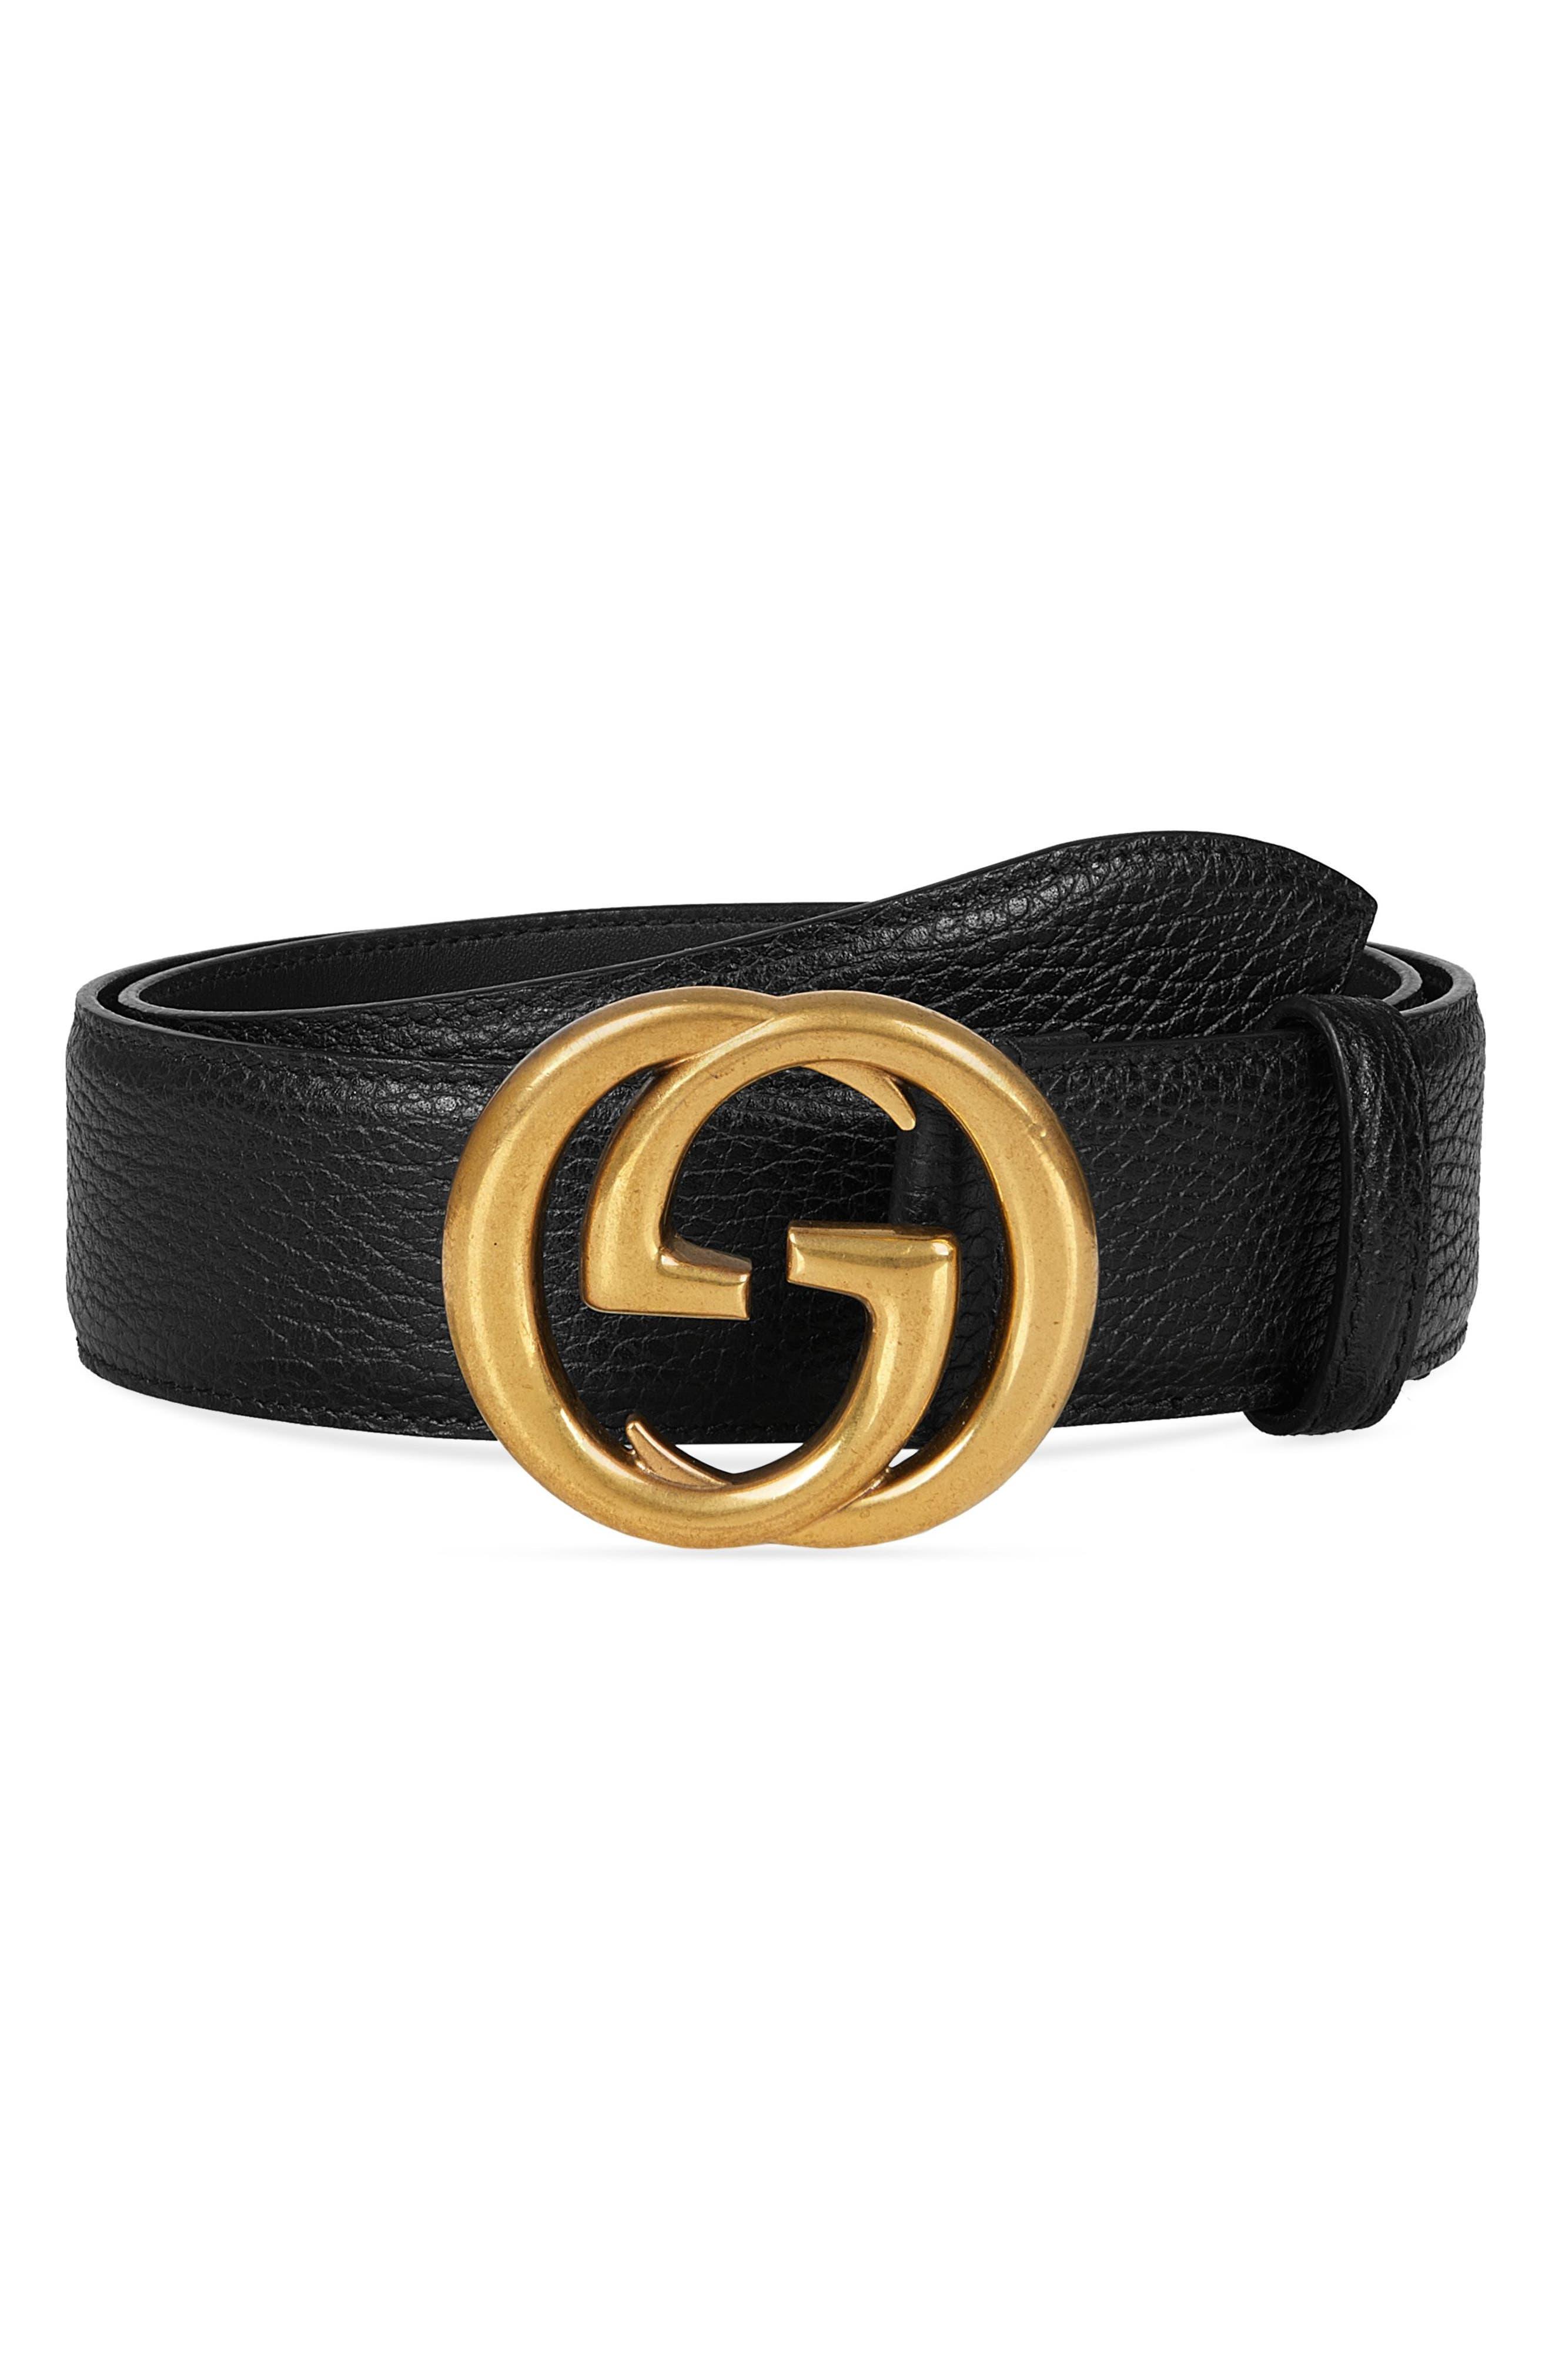 GUCCI Interlocking-G Calfskin Leather Belt, Main, color, BLACK